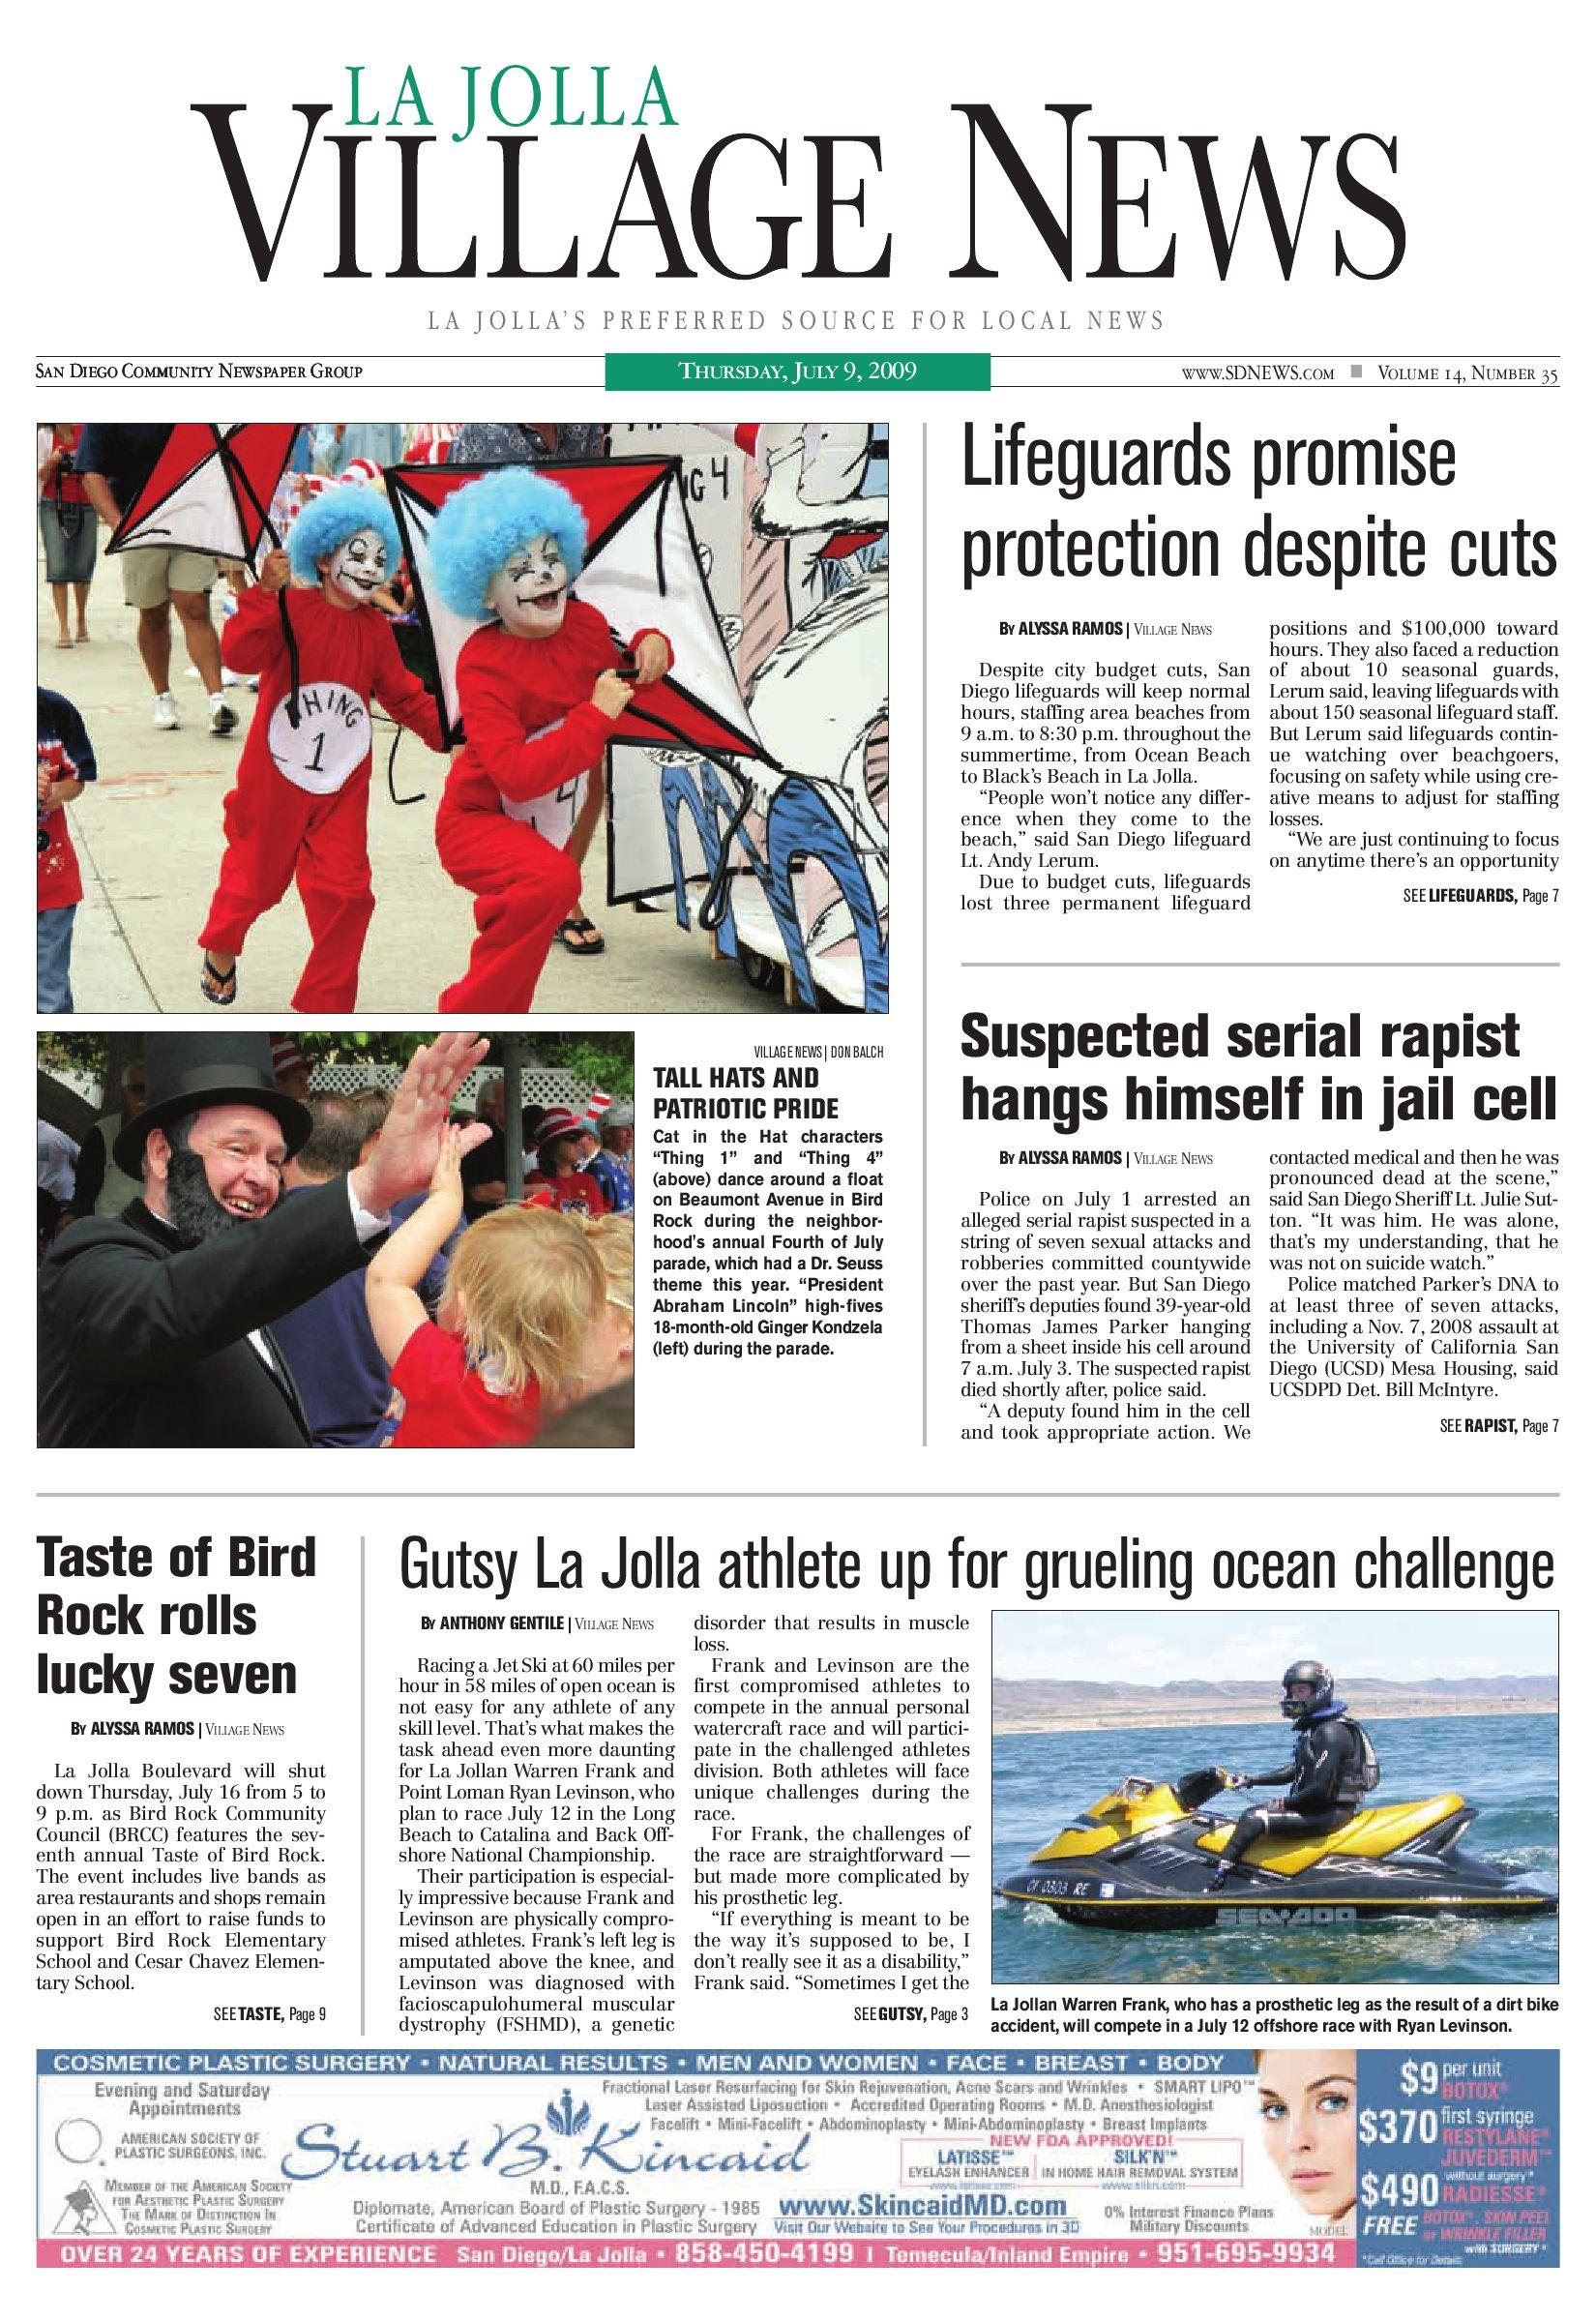 La Jolla Village News July 9th 2009 By San Diego Community Newspaper Group Issuu